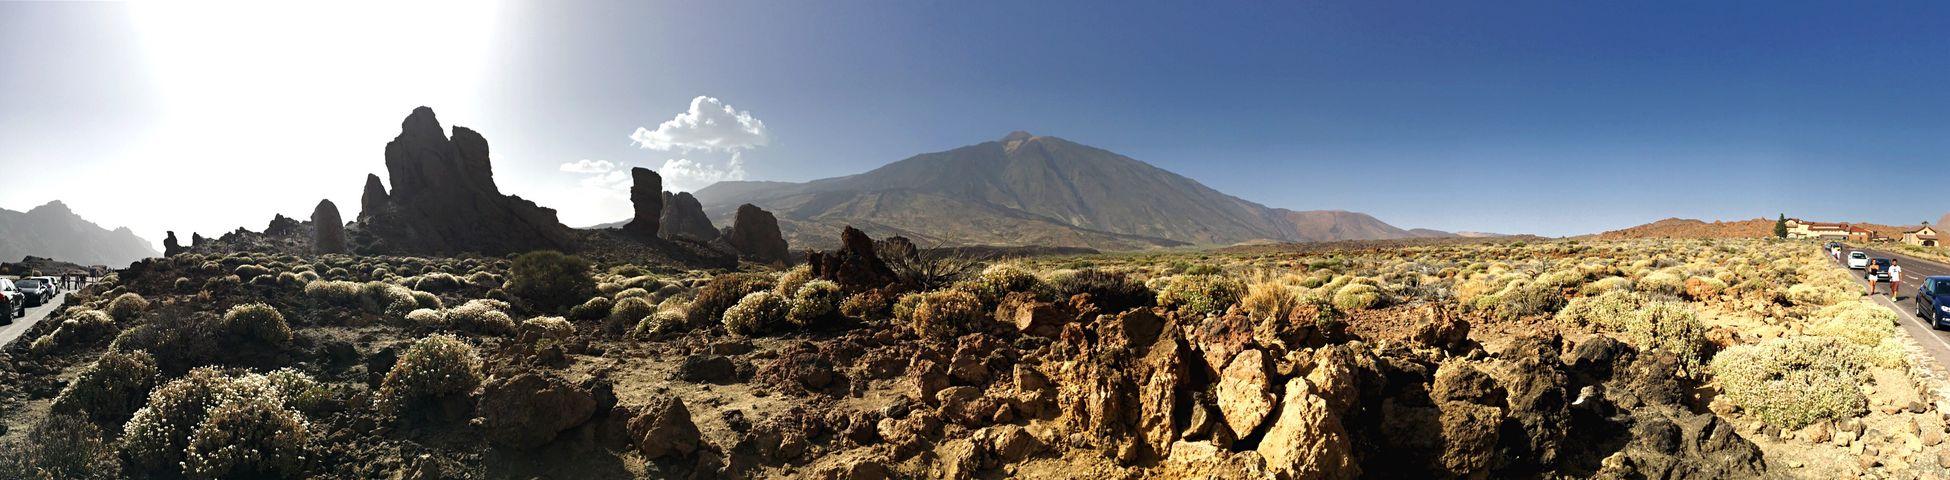 El Teide National Parc